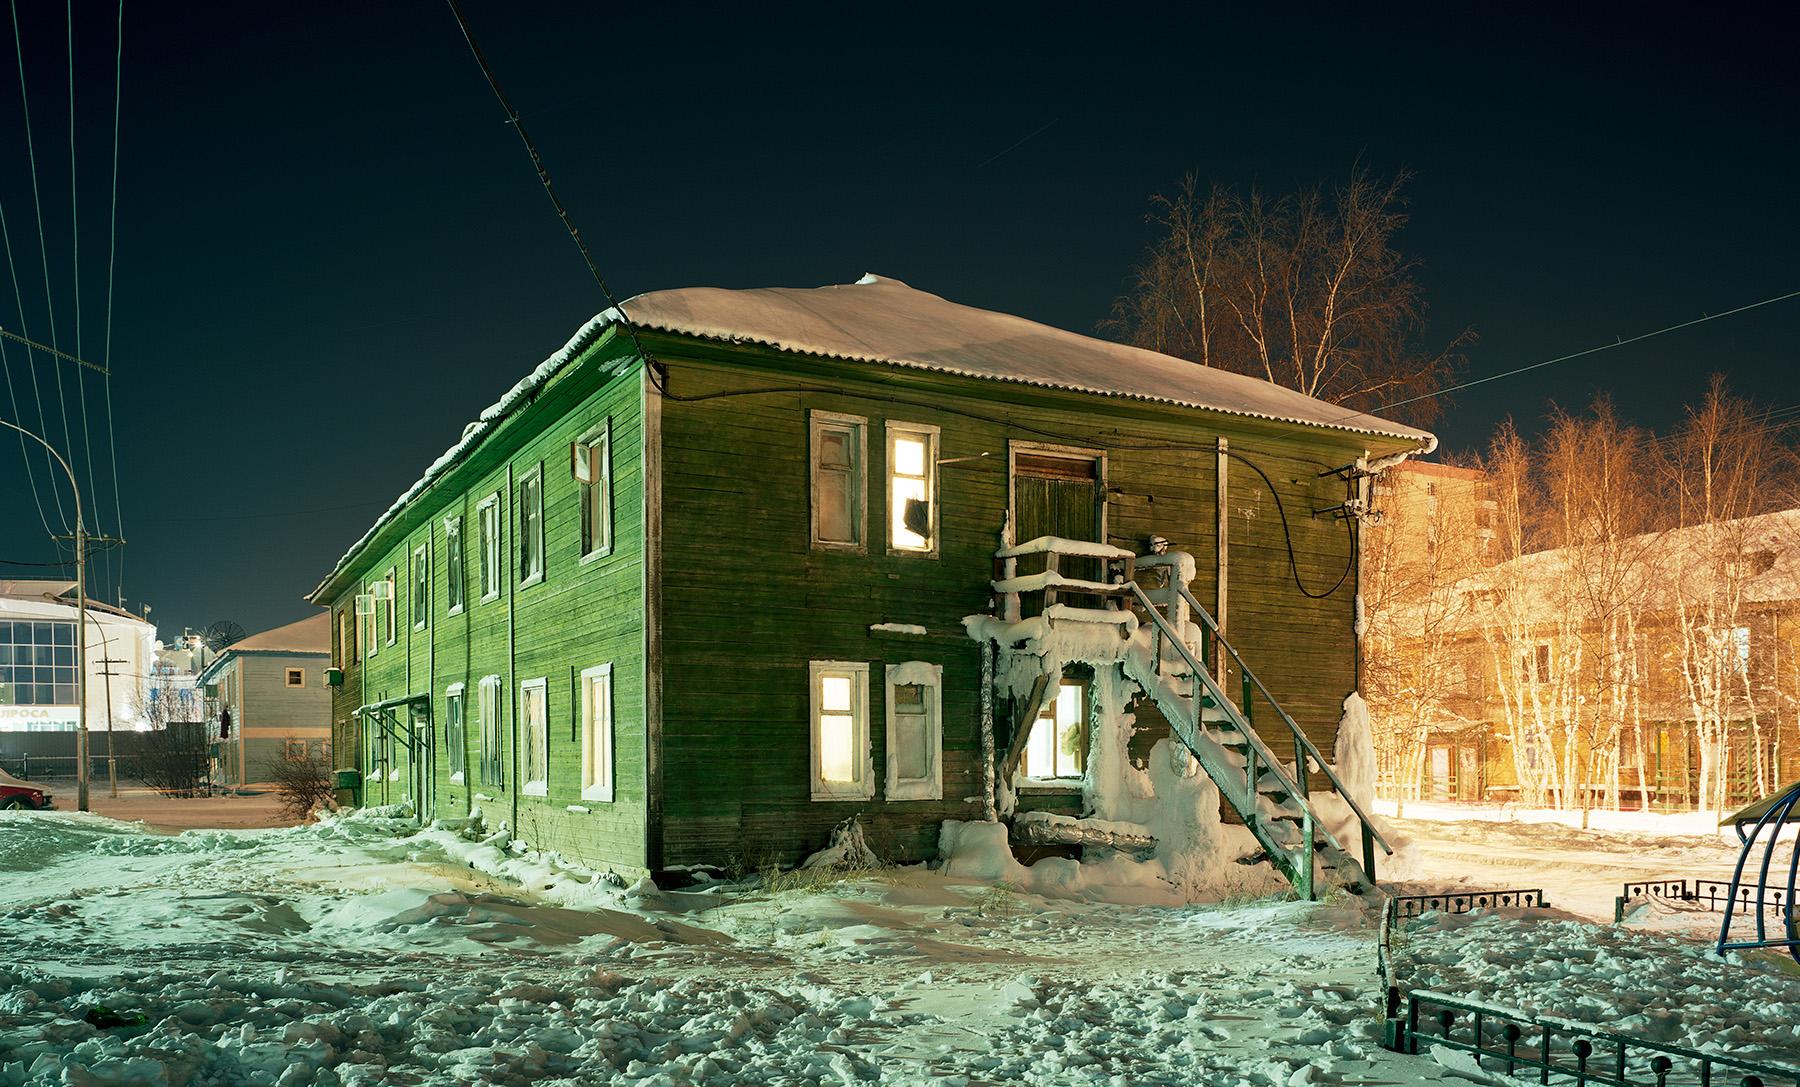 Mirny VI, Yakutia, Russia, 2011